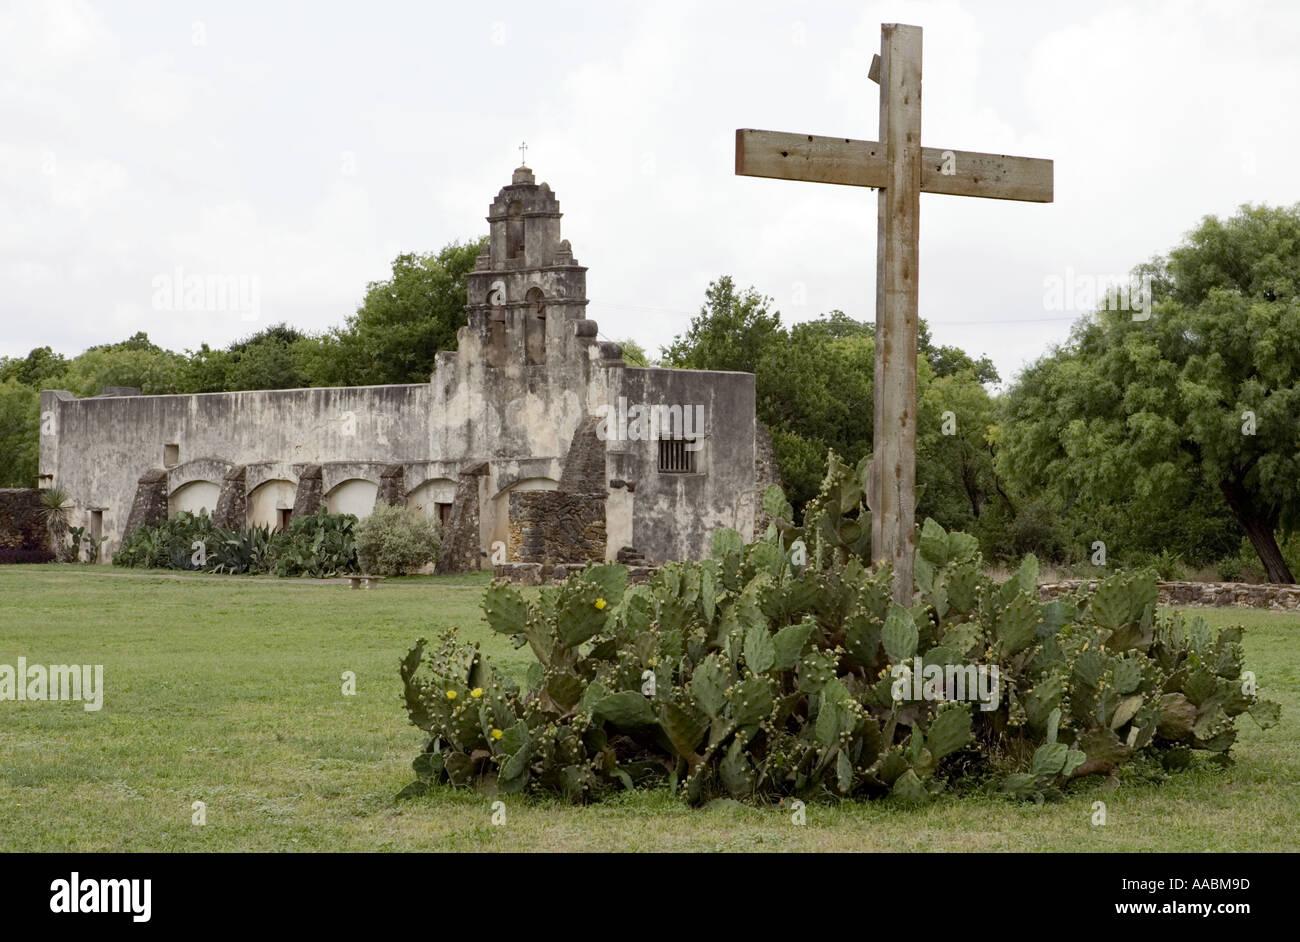 San juan texas holdem